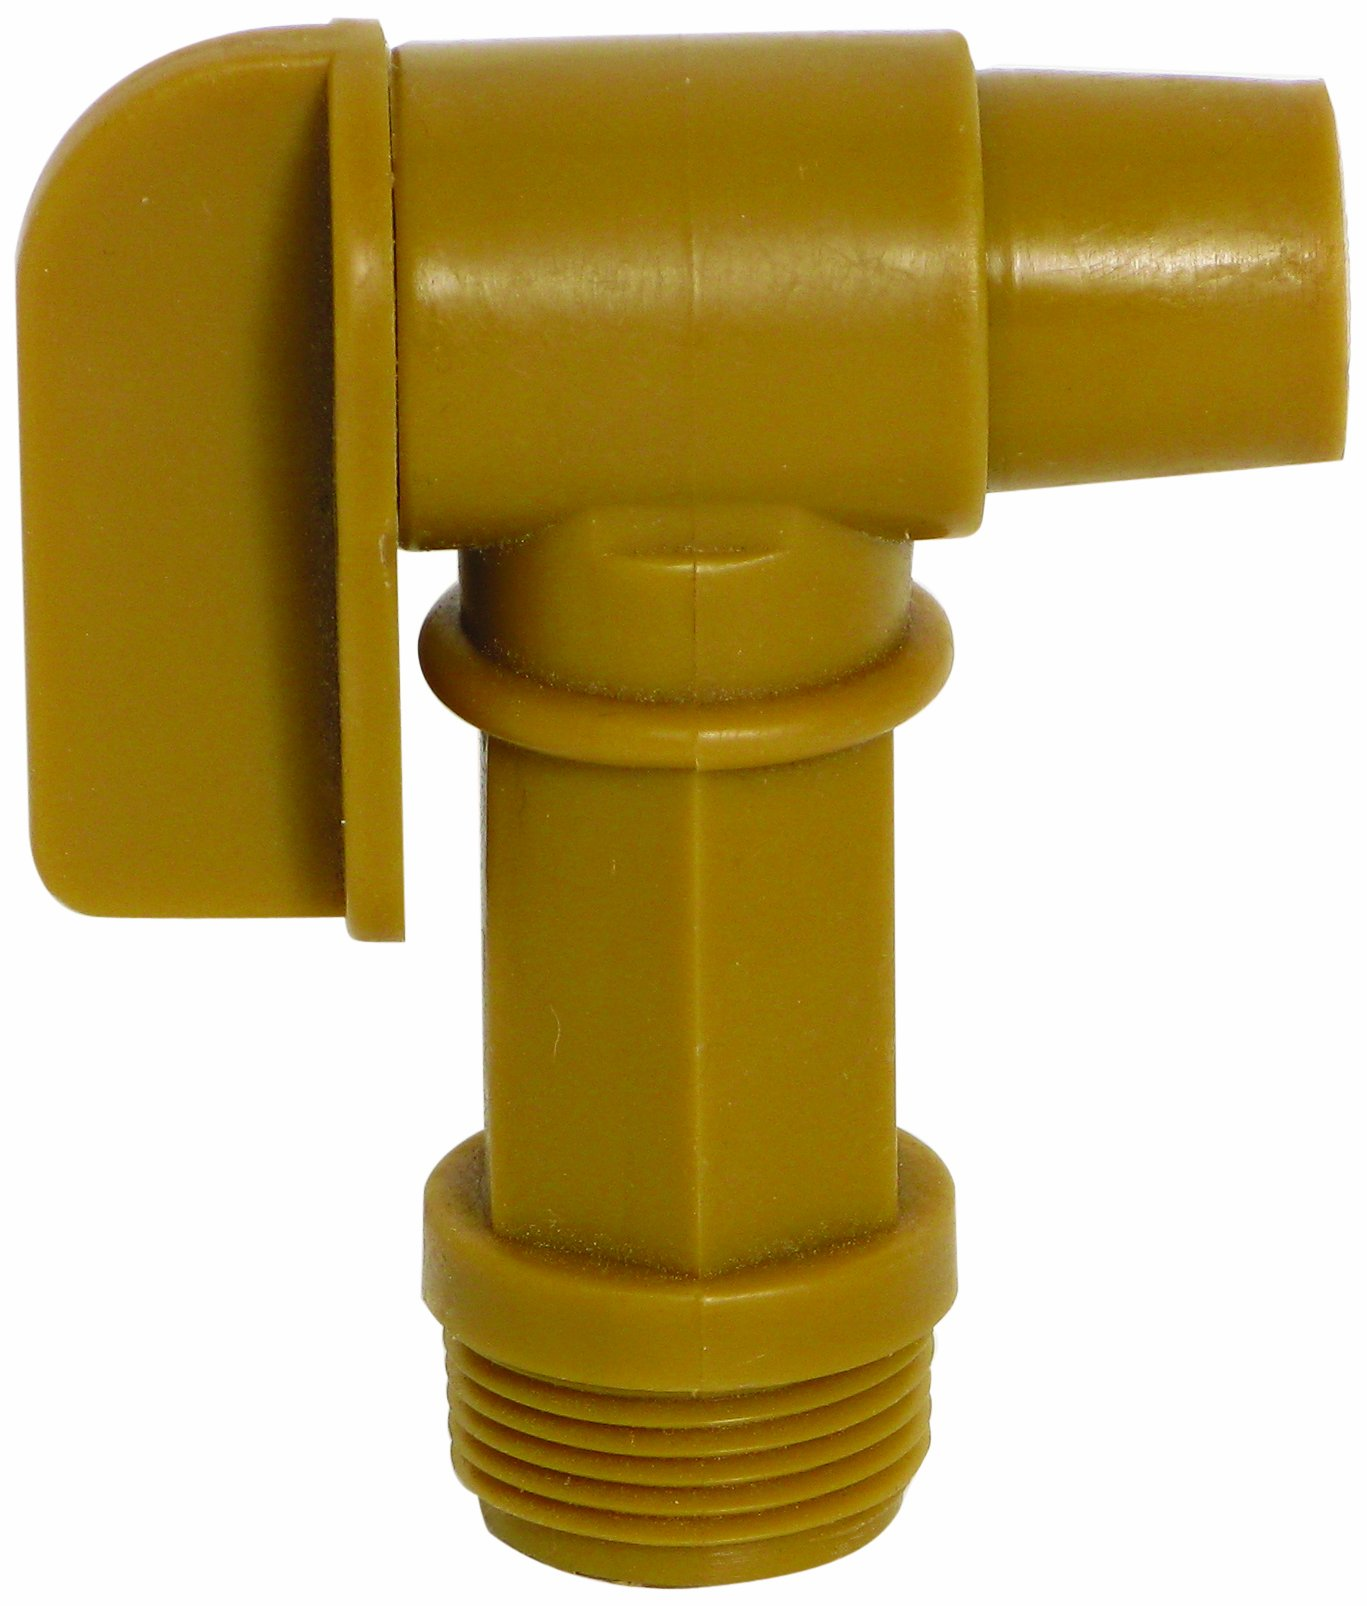 "Wesco 272177 Polyethylene Drum Faucet, 0.75"" Size"